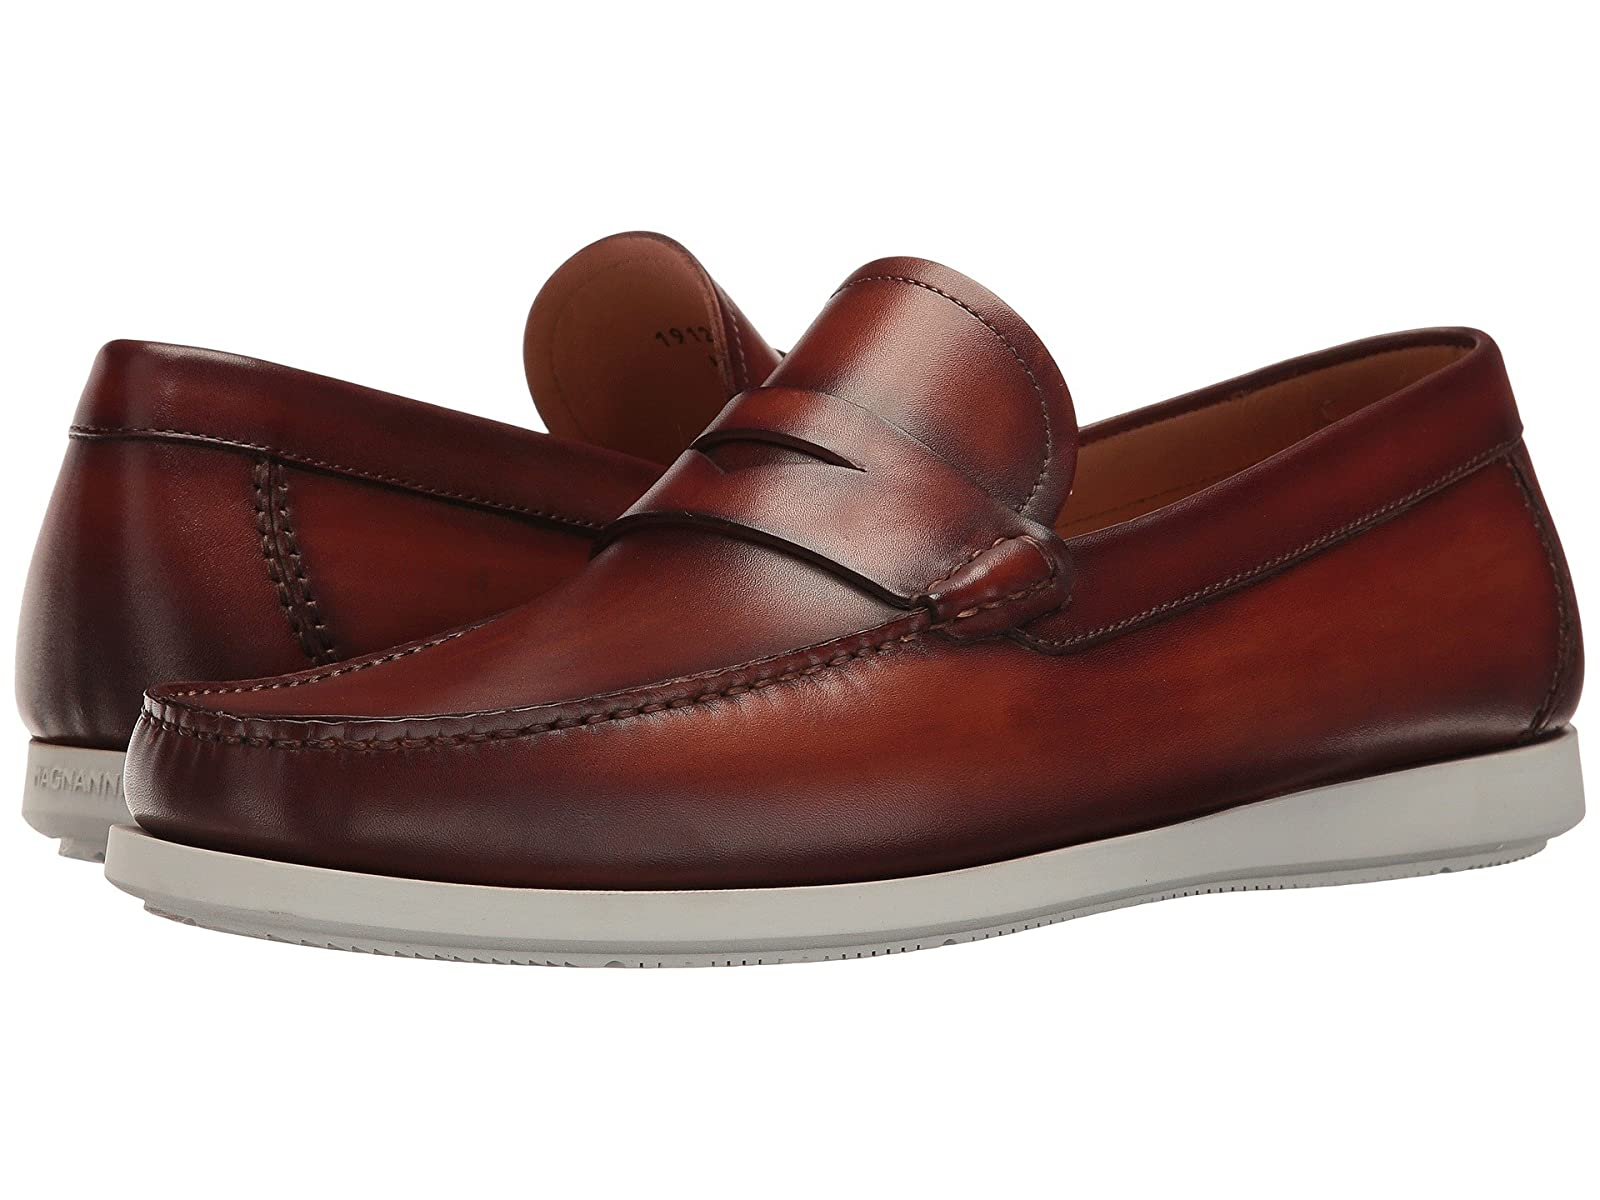 Magnanni LagunaAtmospheric grades have affordable shoes